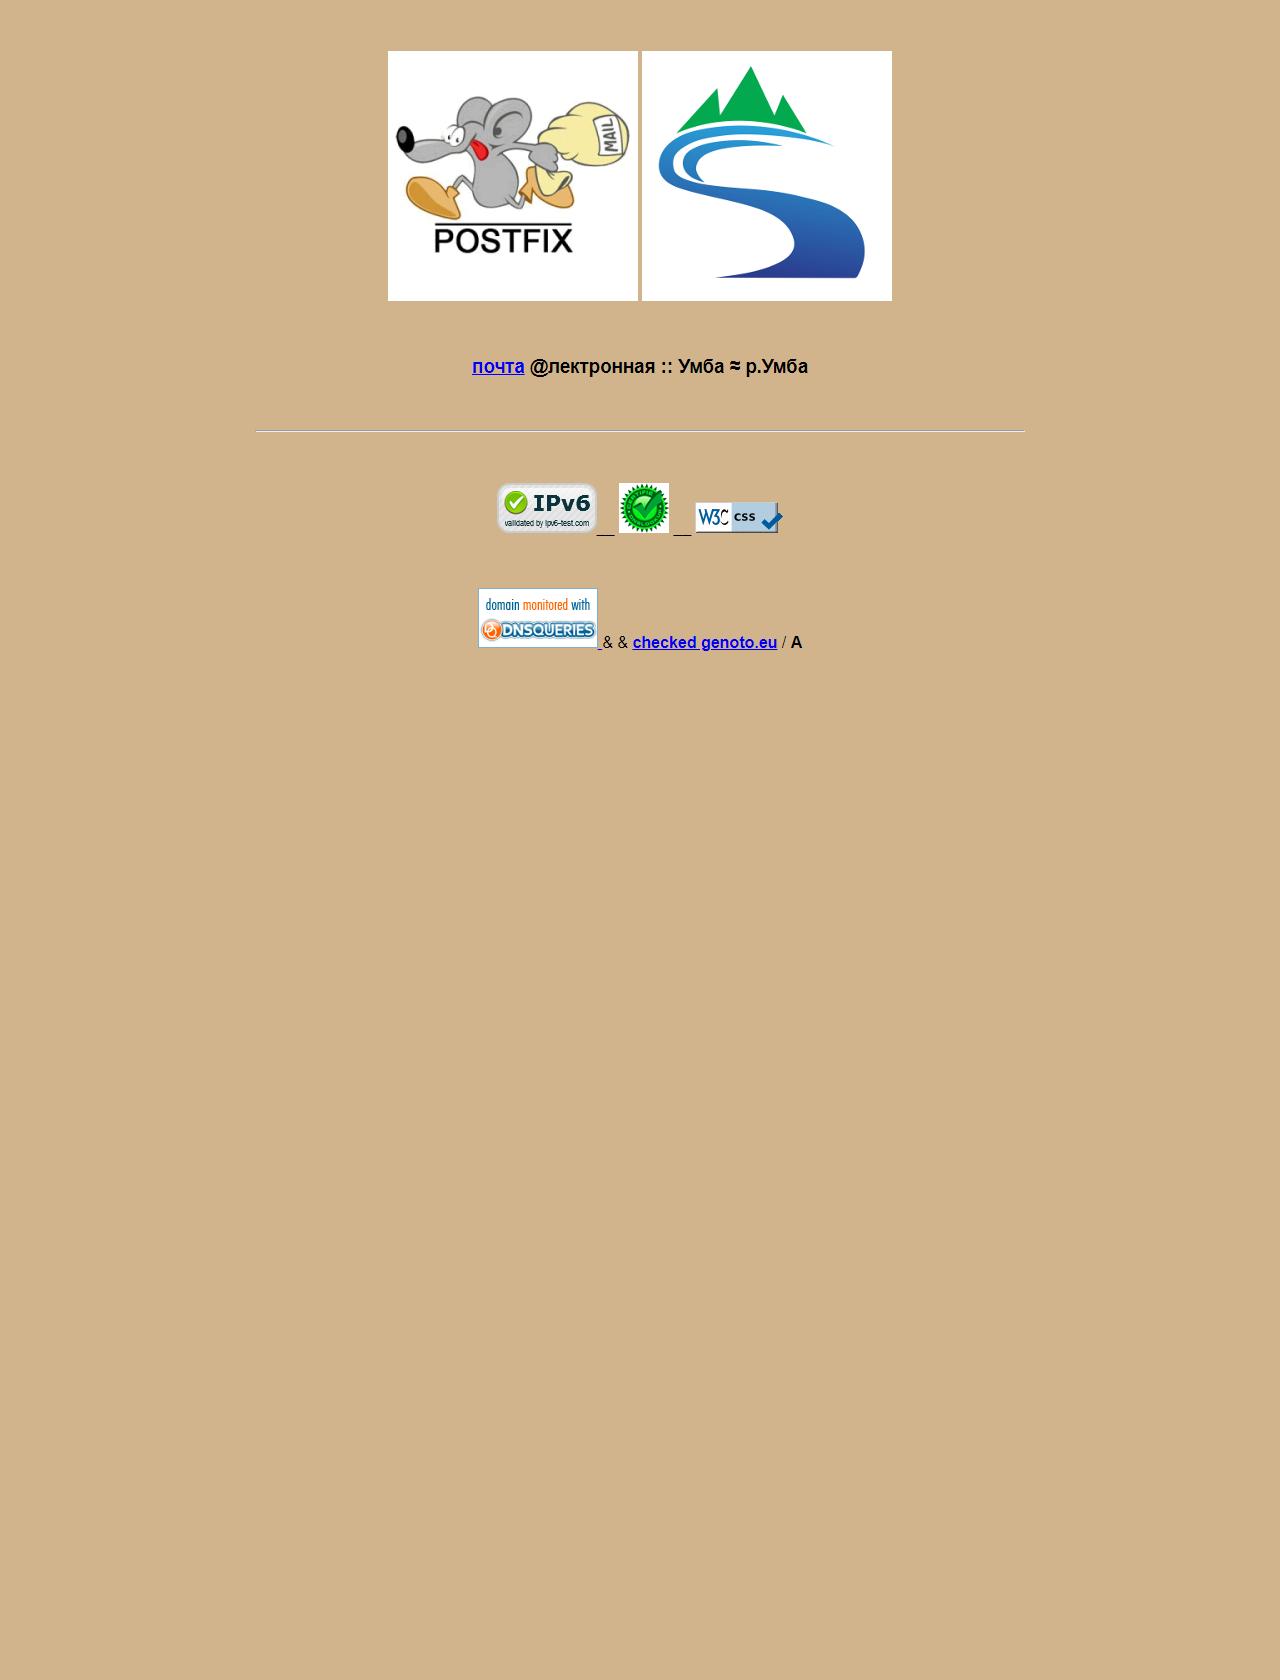 Screenshot Desktop - https://genoto.eu/